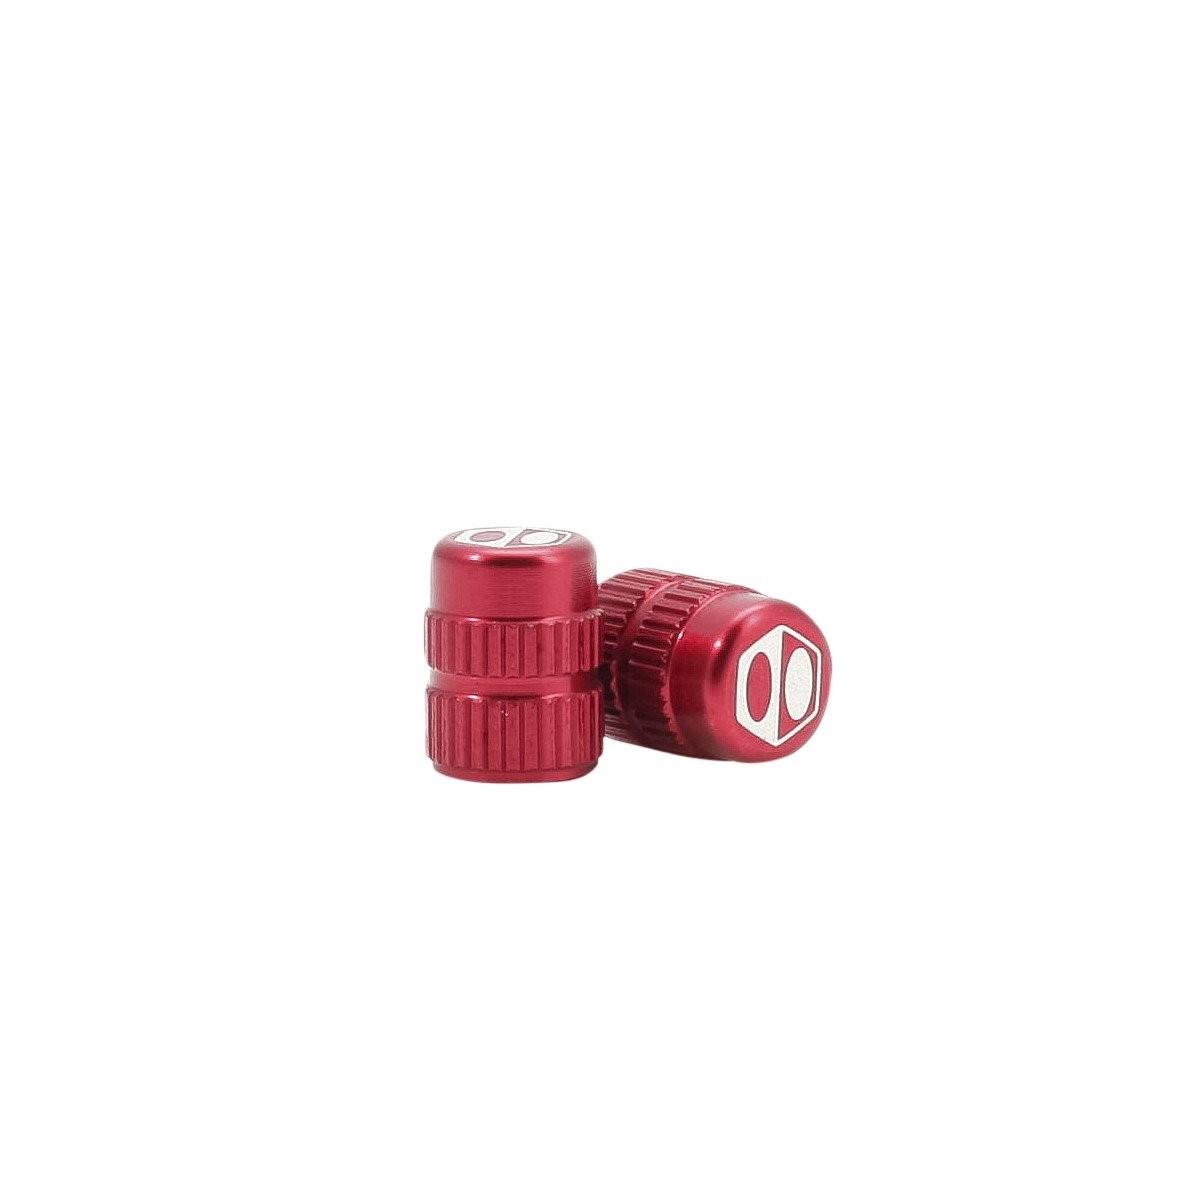 BOX ONE CUBE SCHRADER VALVE CAPS